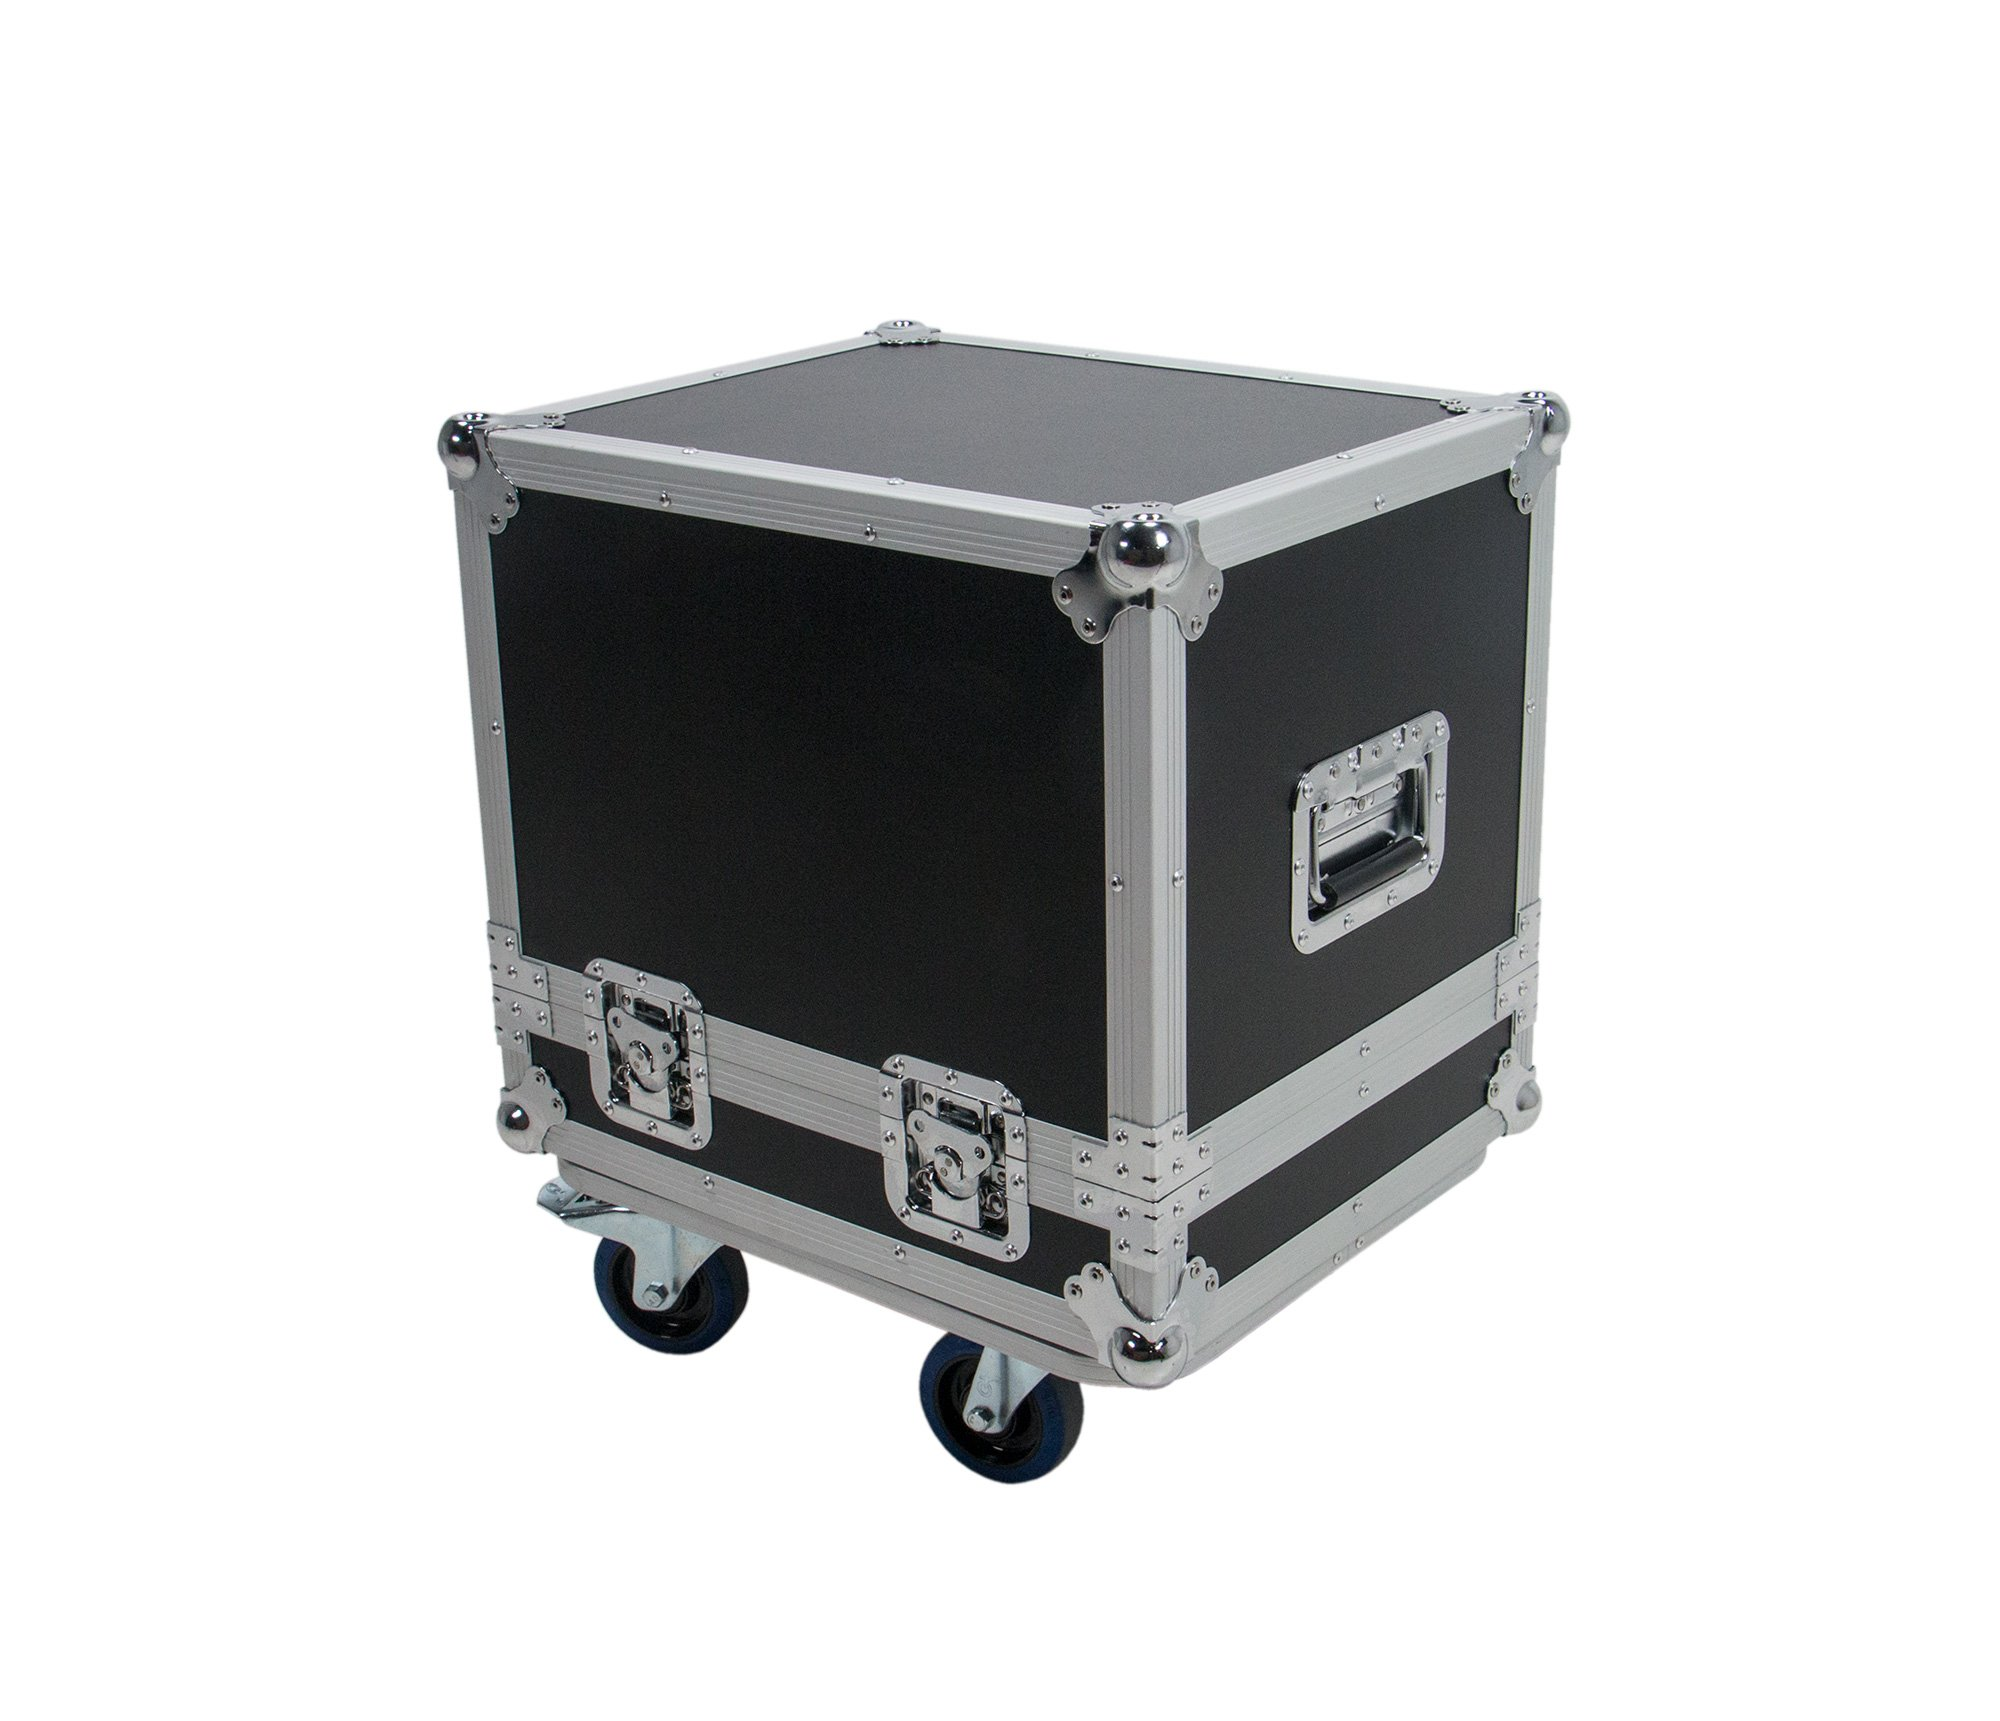 OSP Cases | ATA Road Case | Amplifier Case for Fender Blues Jr | ATA-BLUES-JR